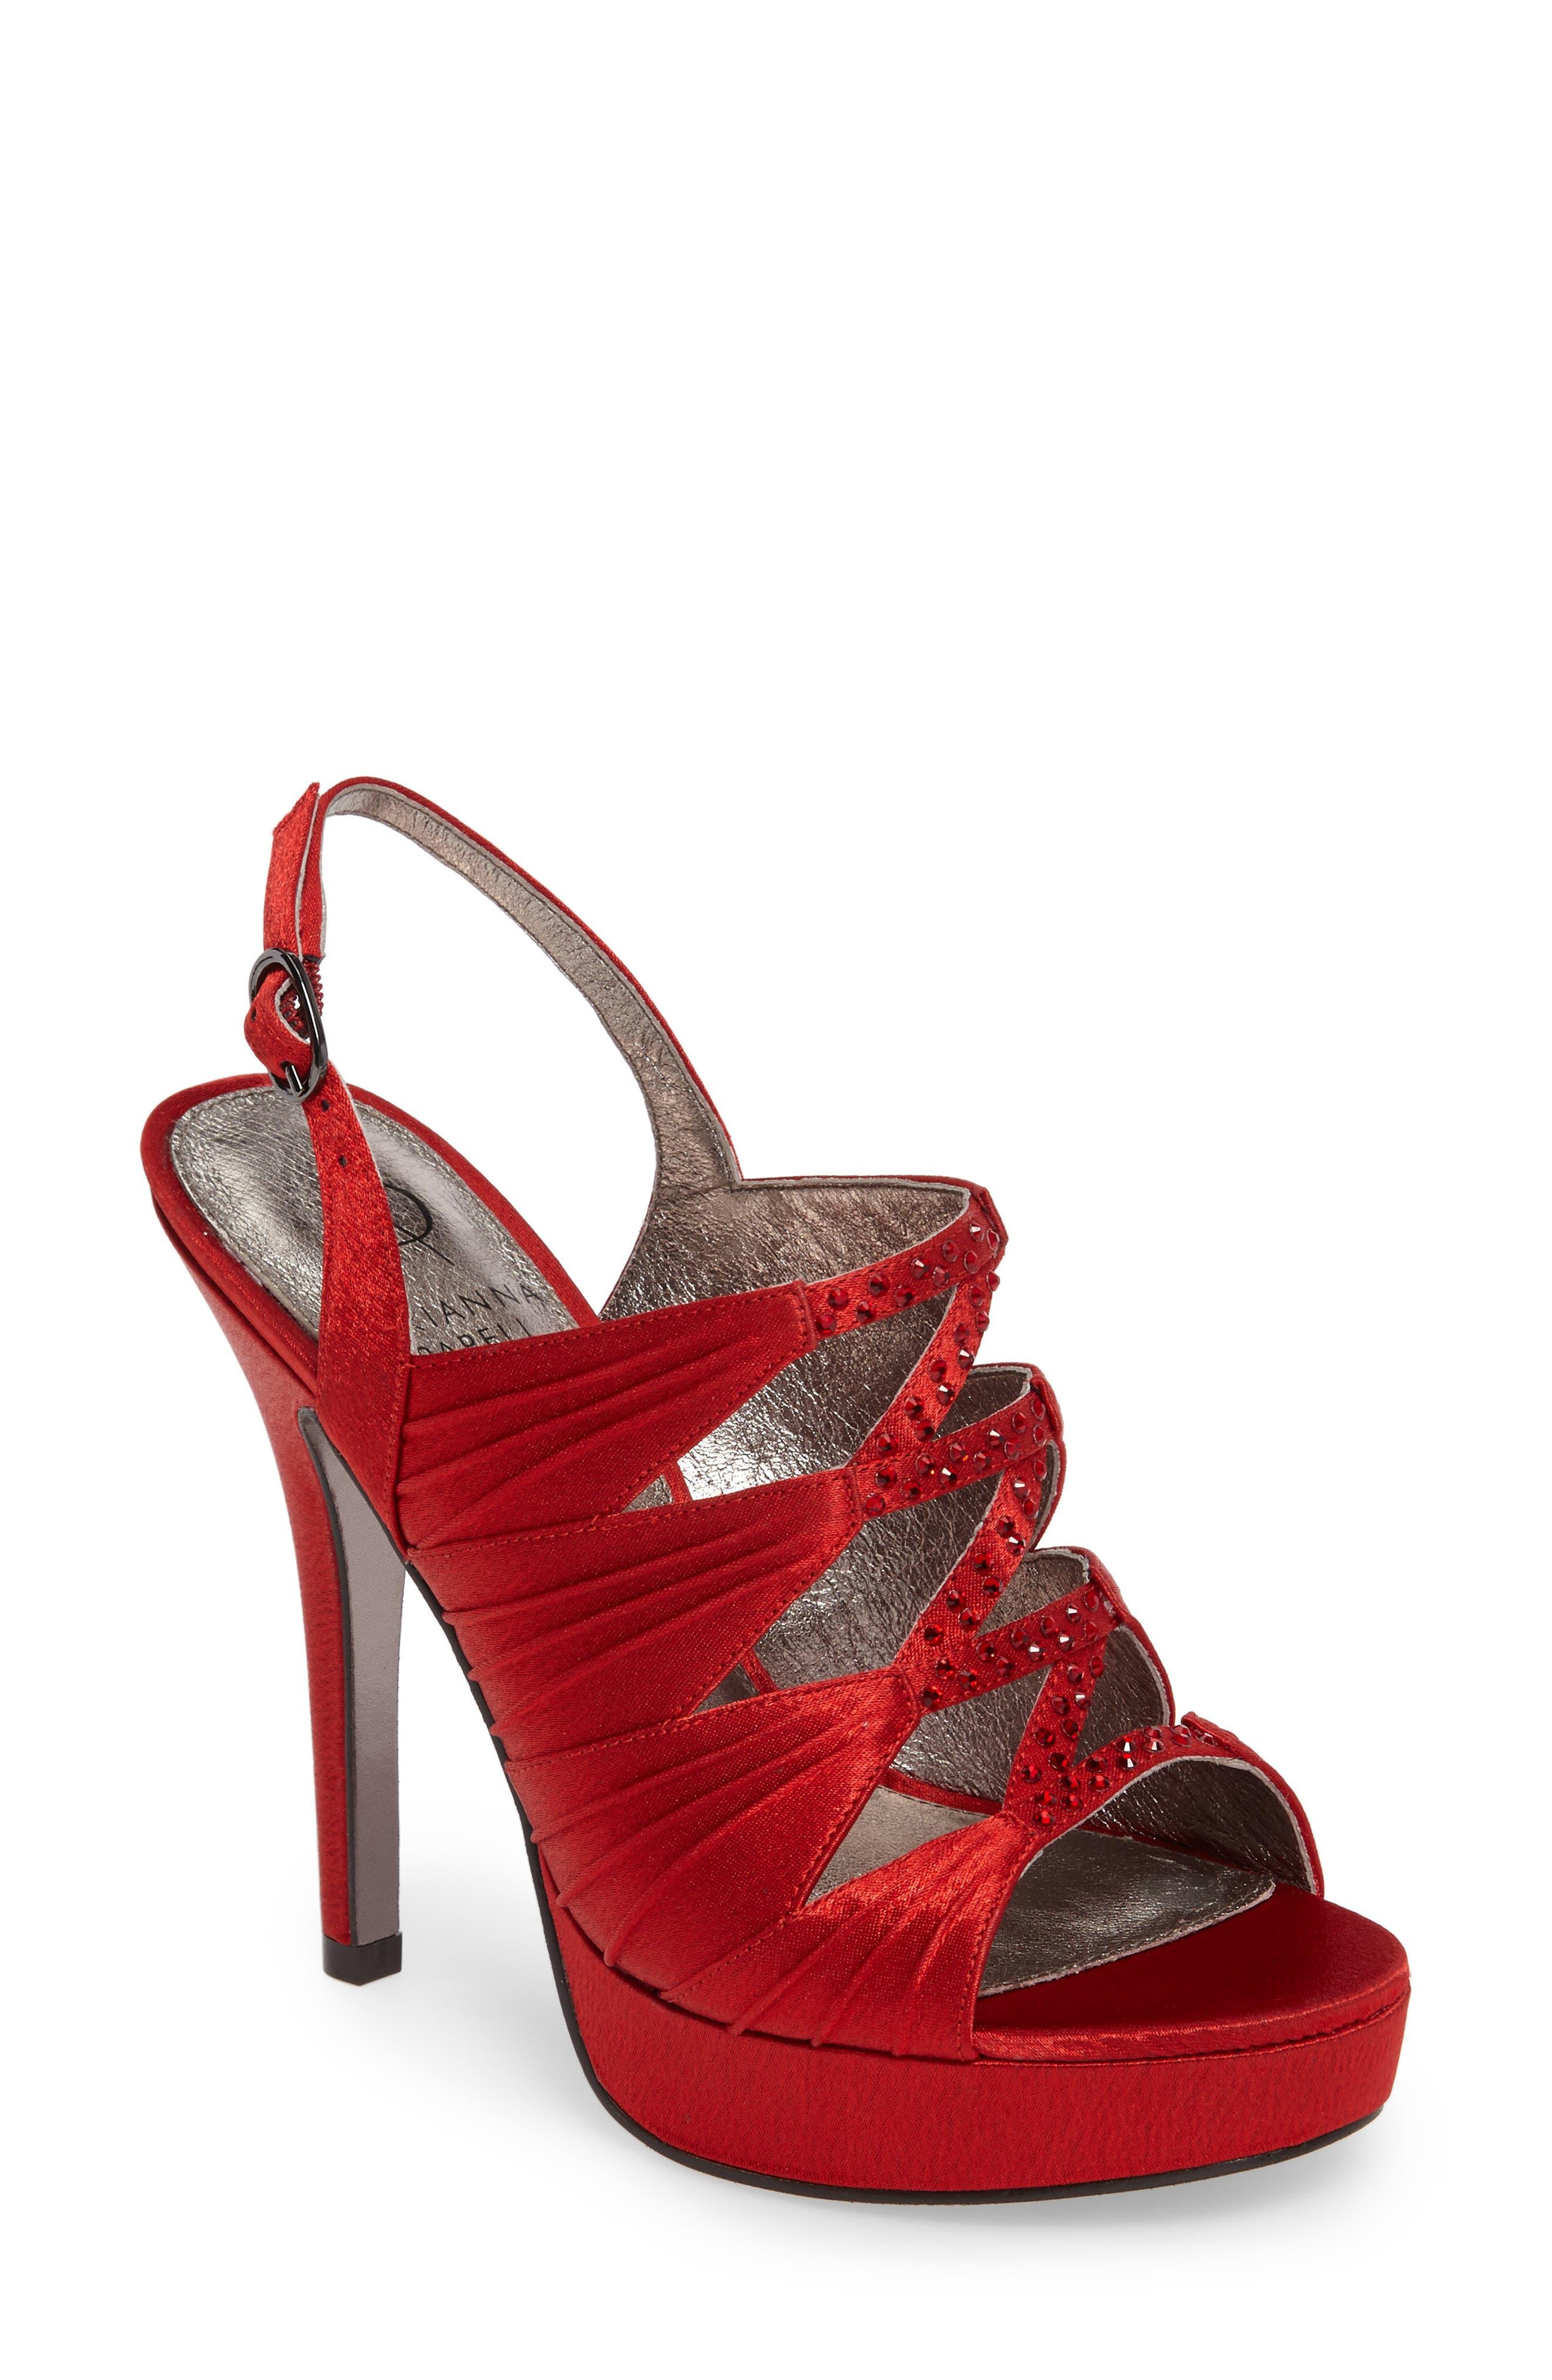 Adrianna Pappell Marissa Platform Sandal (Women)